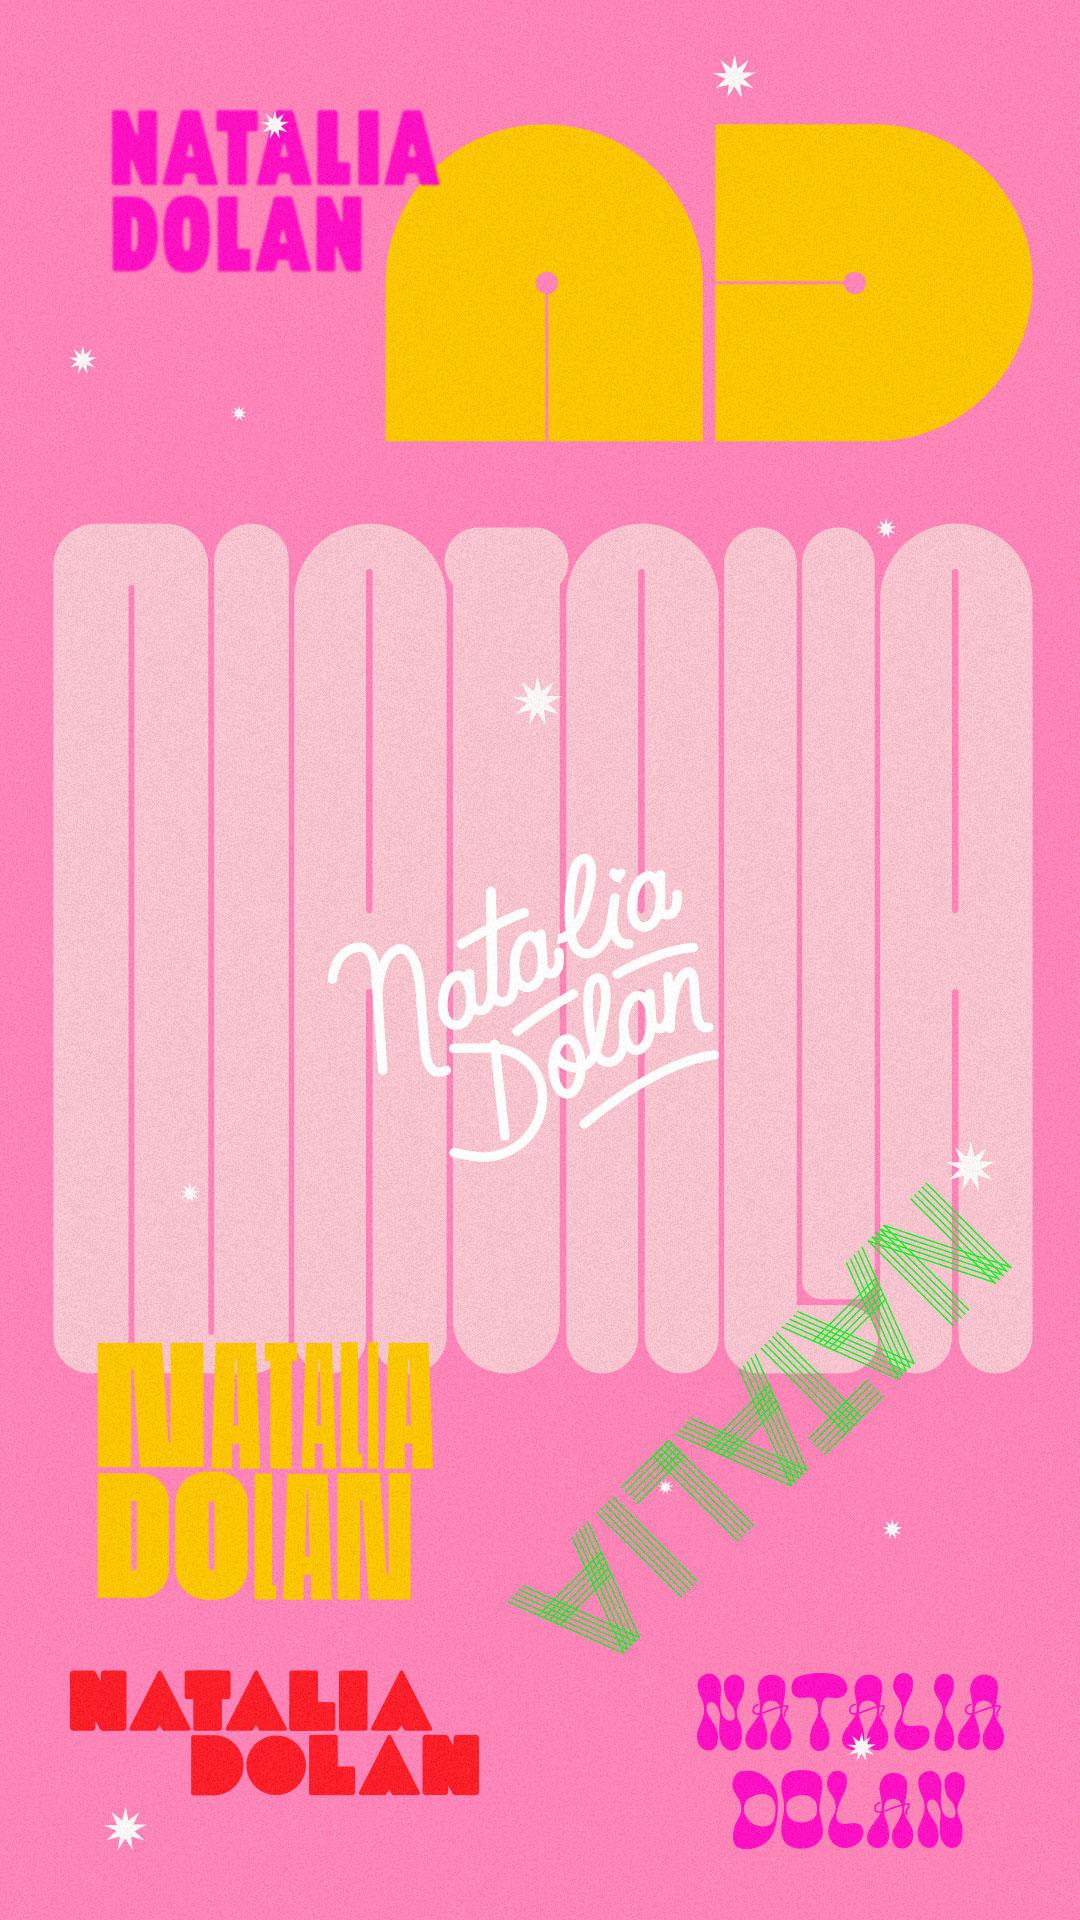 NataliaDolan_LogoDesign_StoryCollage02.jpg